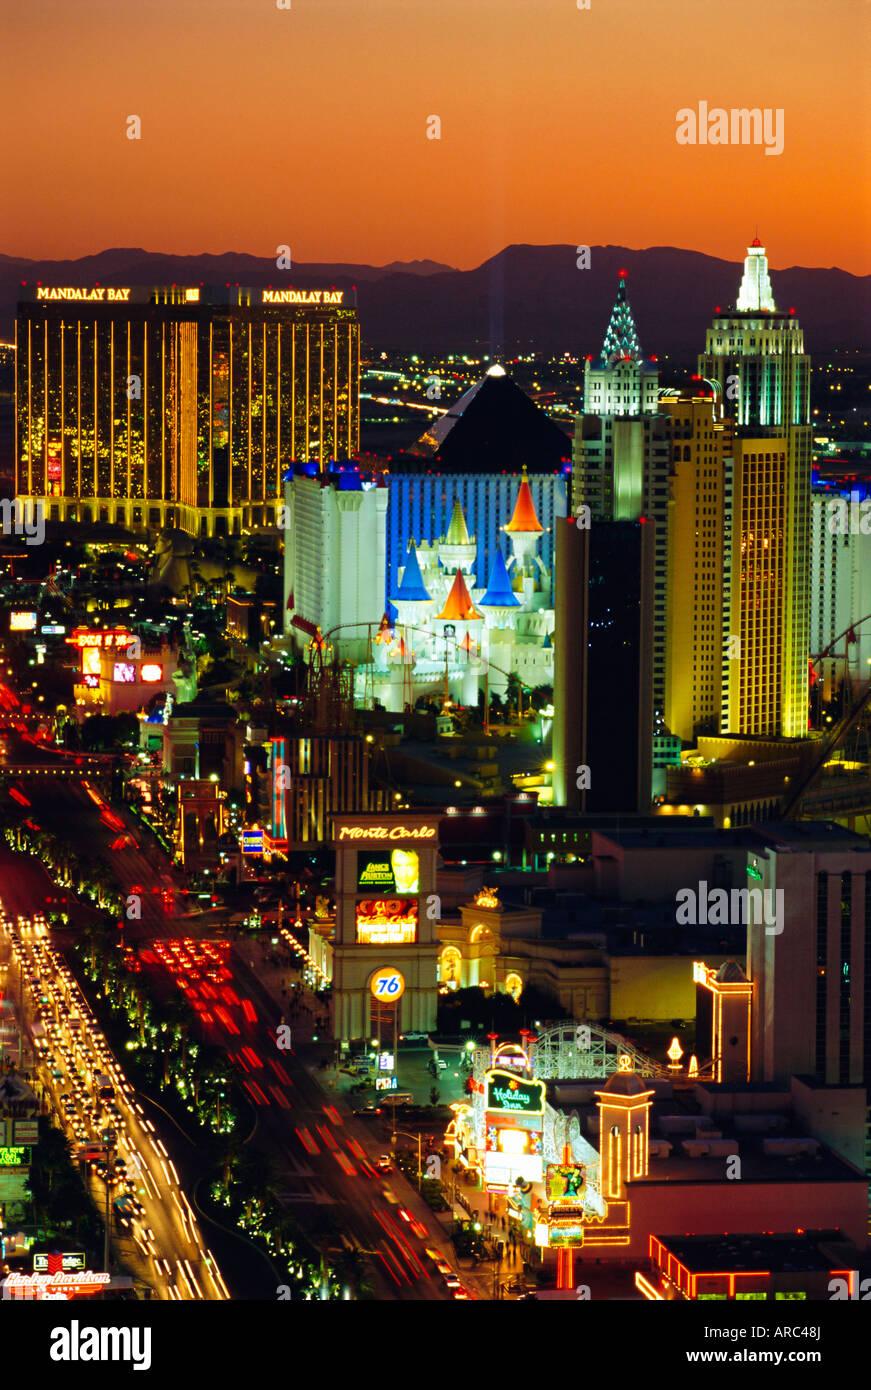 Casinos on best odds in slot machines